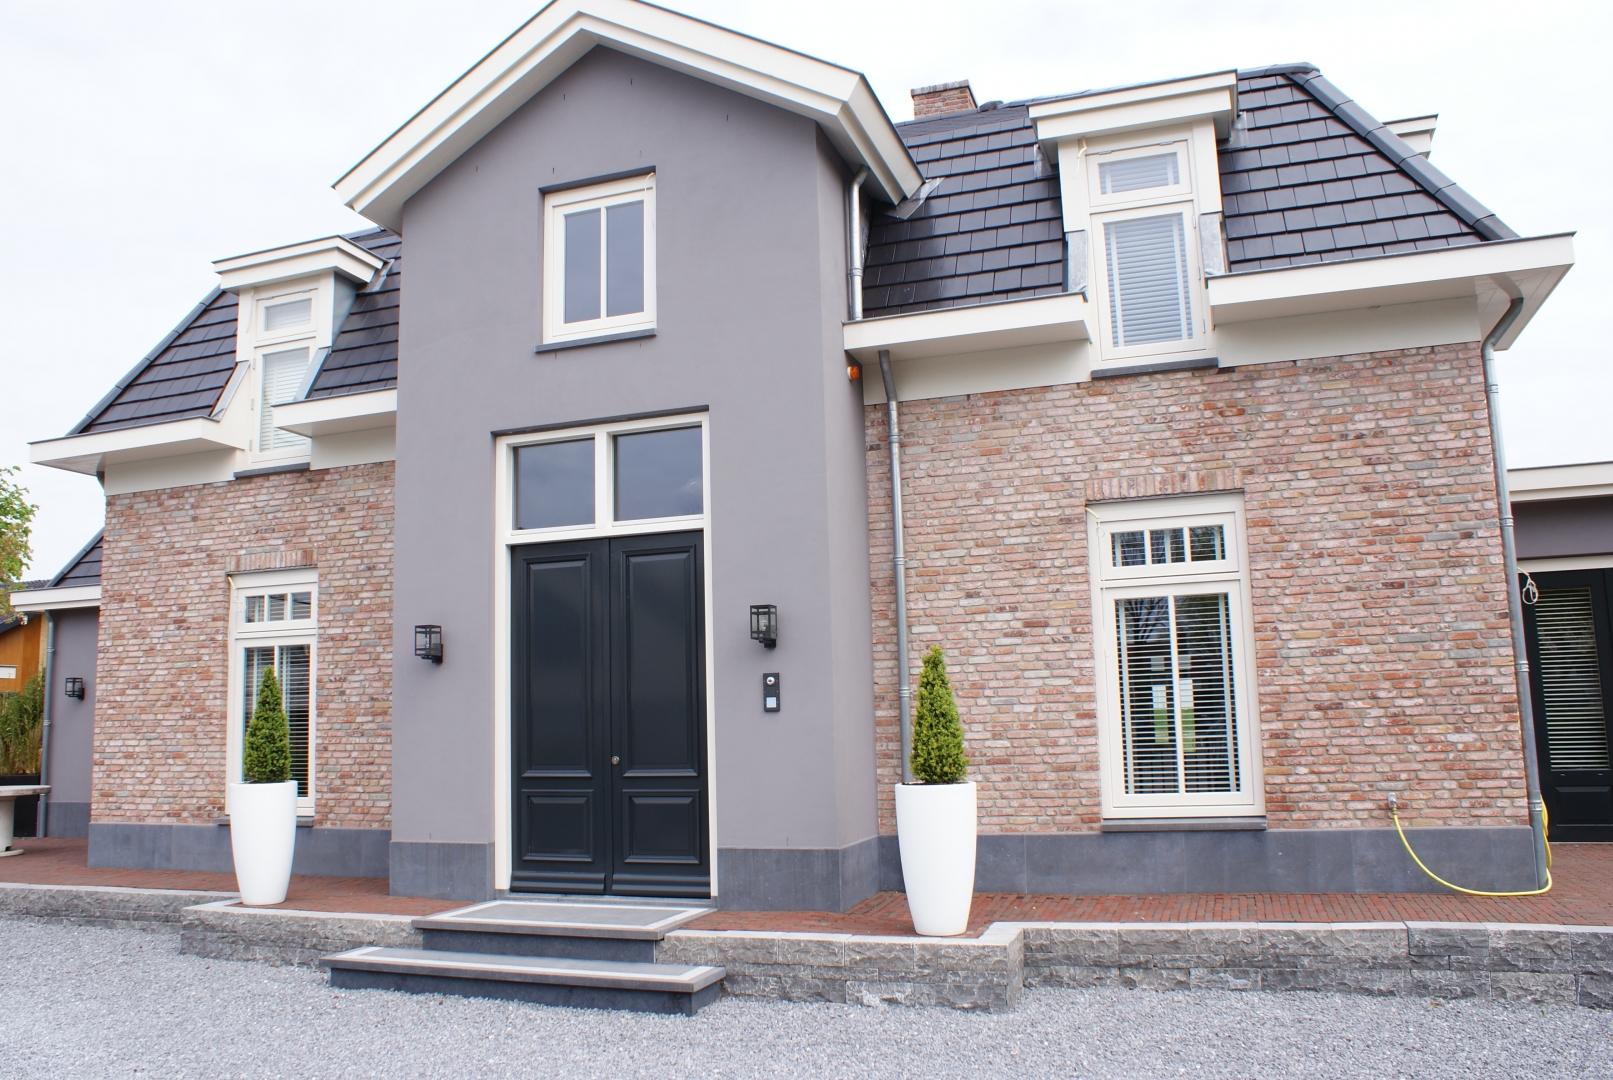 Nieuwbouw moderne statige villa met garage in Bunschoten-Spakenburg